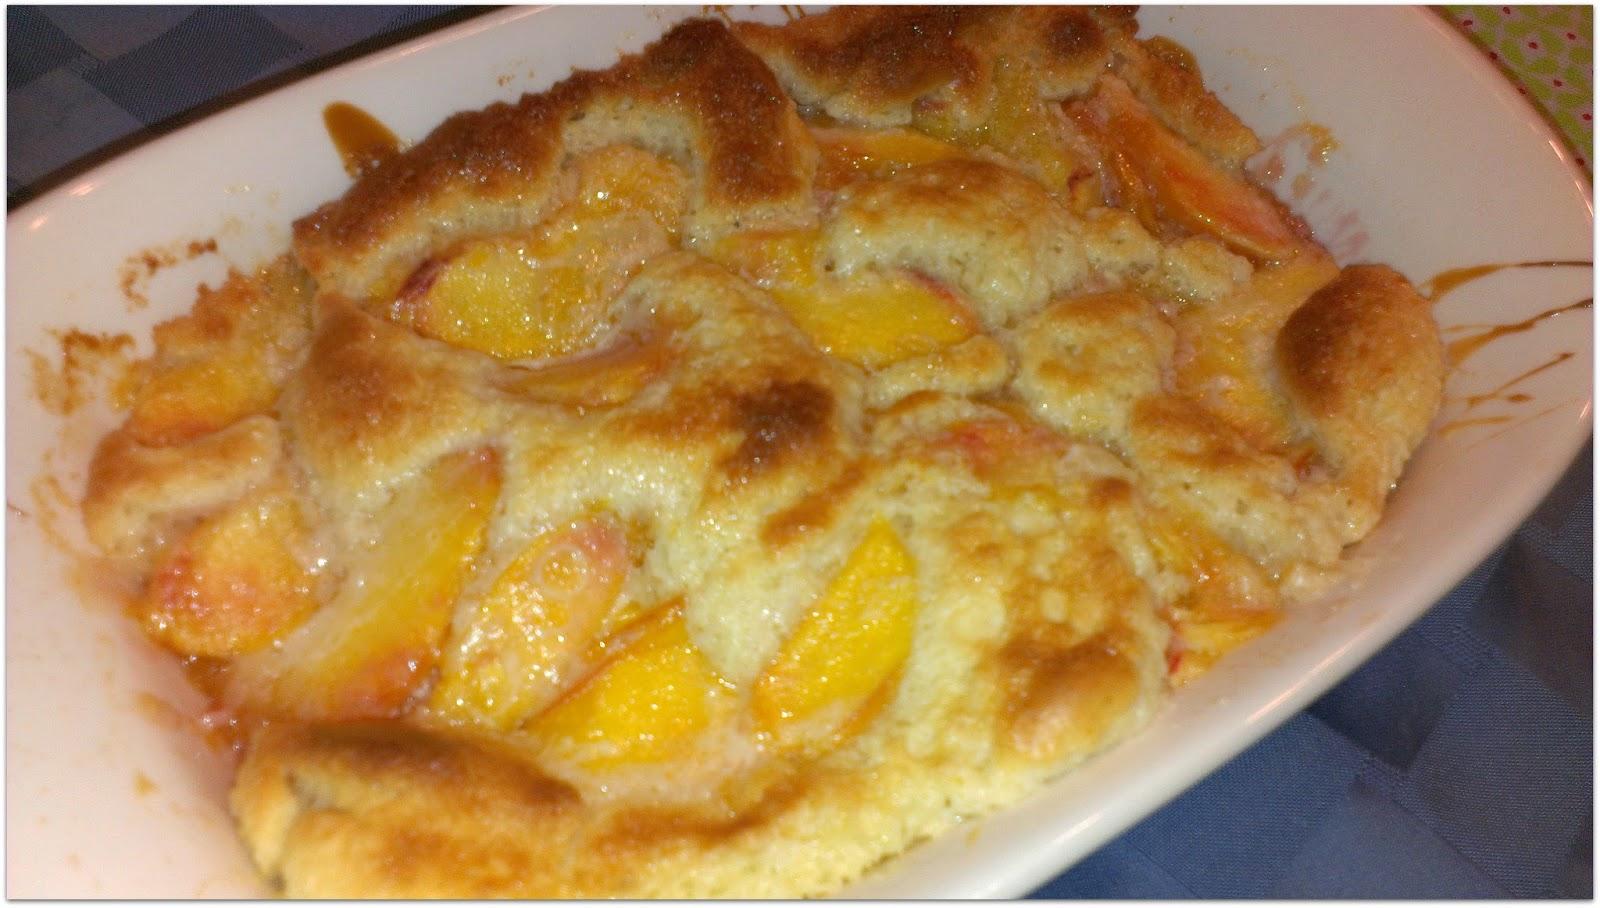 Peach Cobbler With Sweetened Condensed Milk